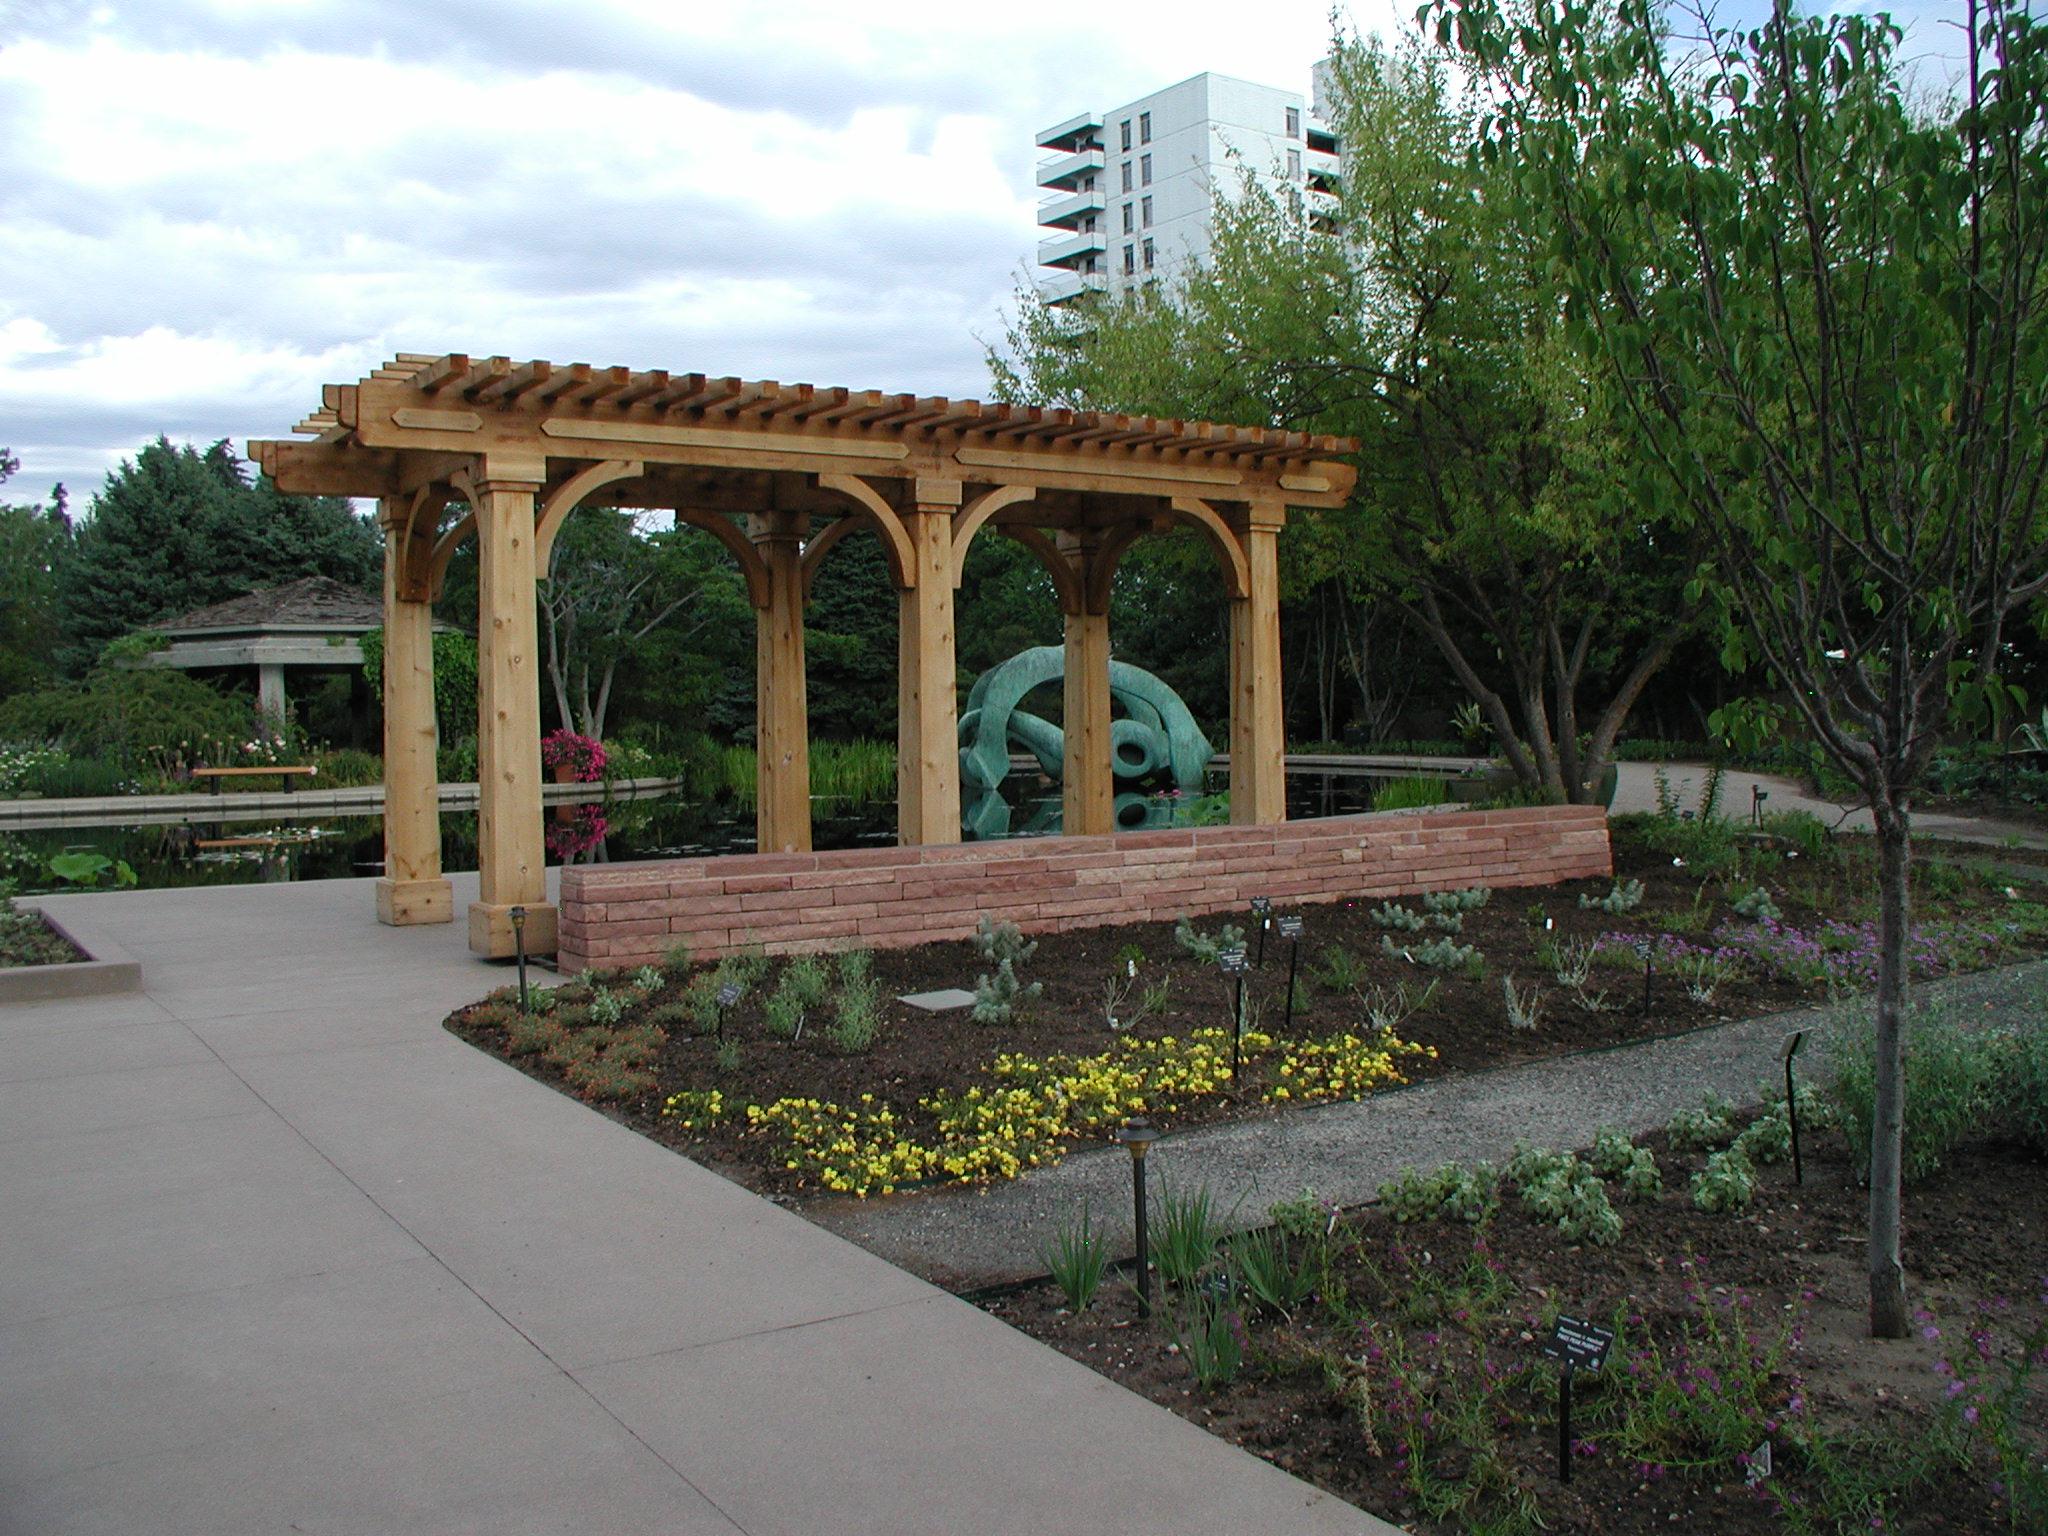 Olive Garden Grossmont Center Olive Garden Grossmont Center David Reed Landscape Architects